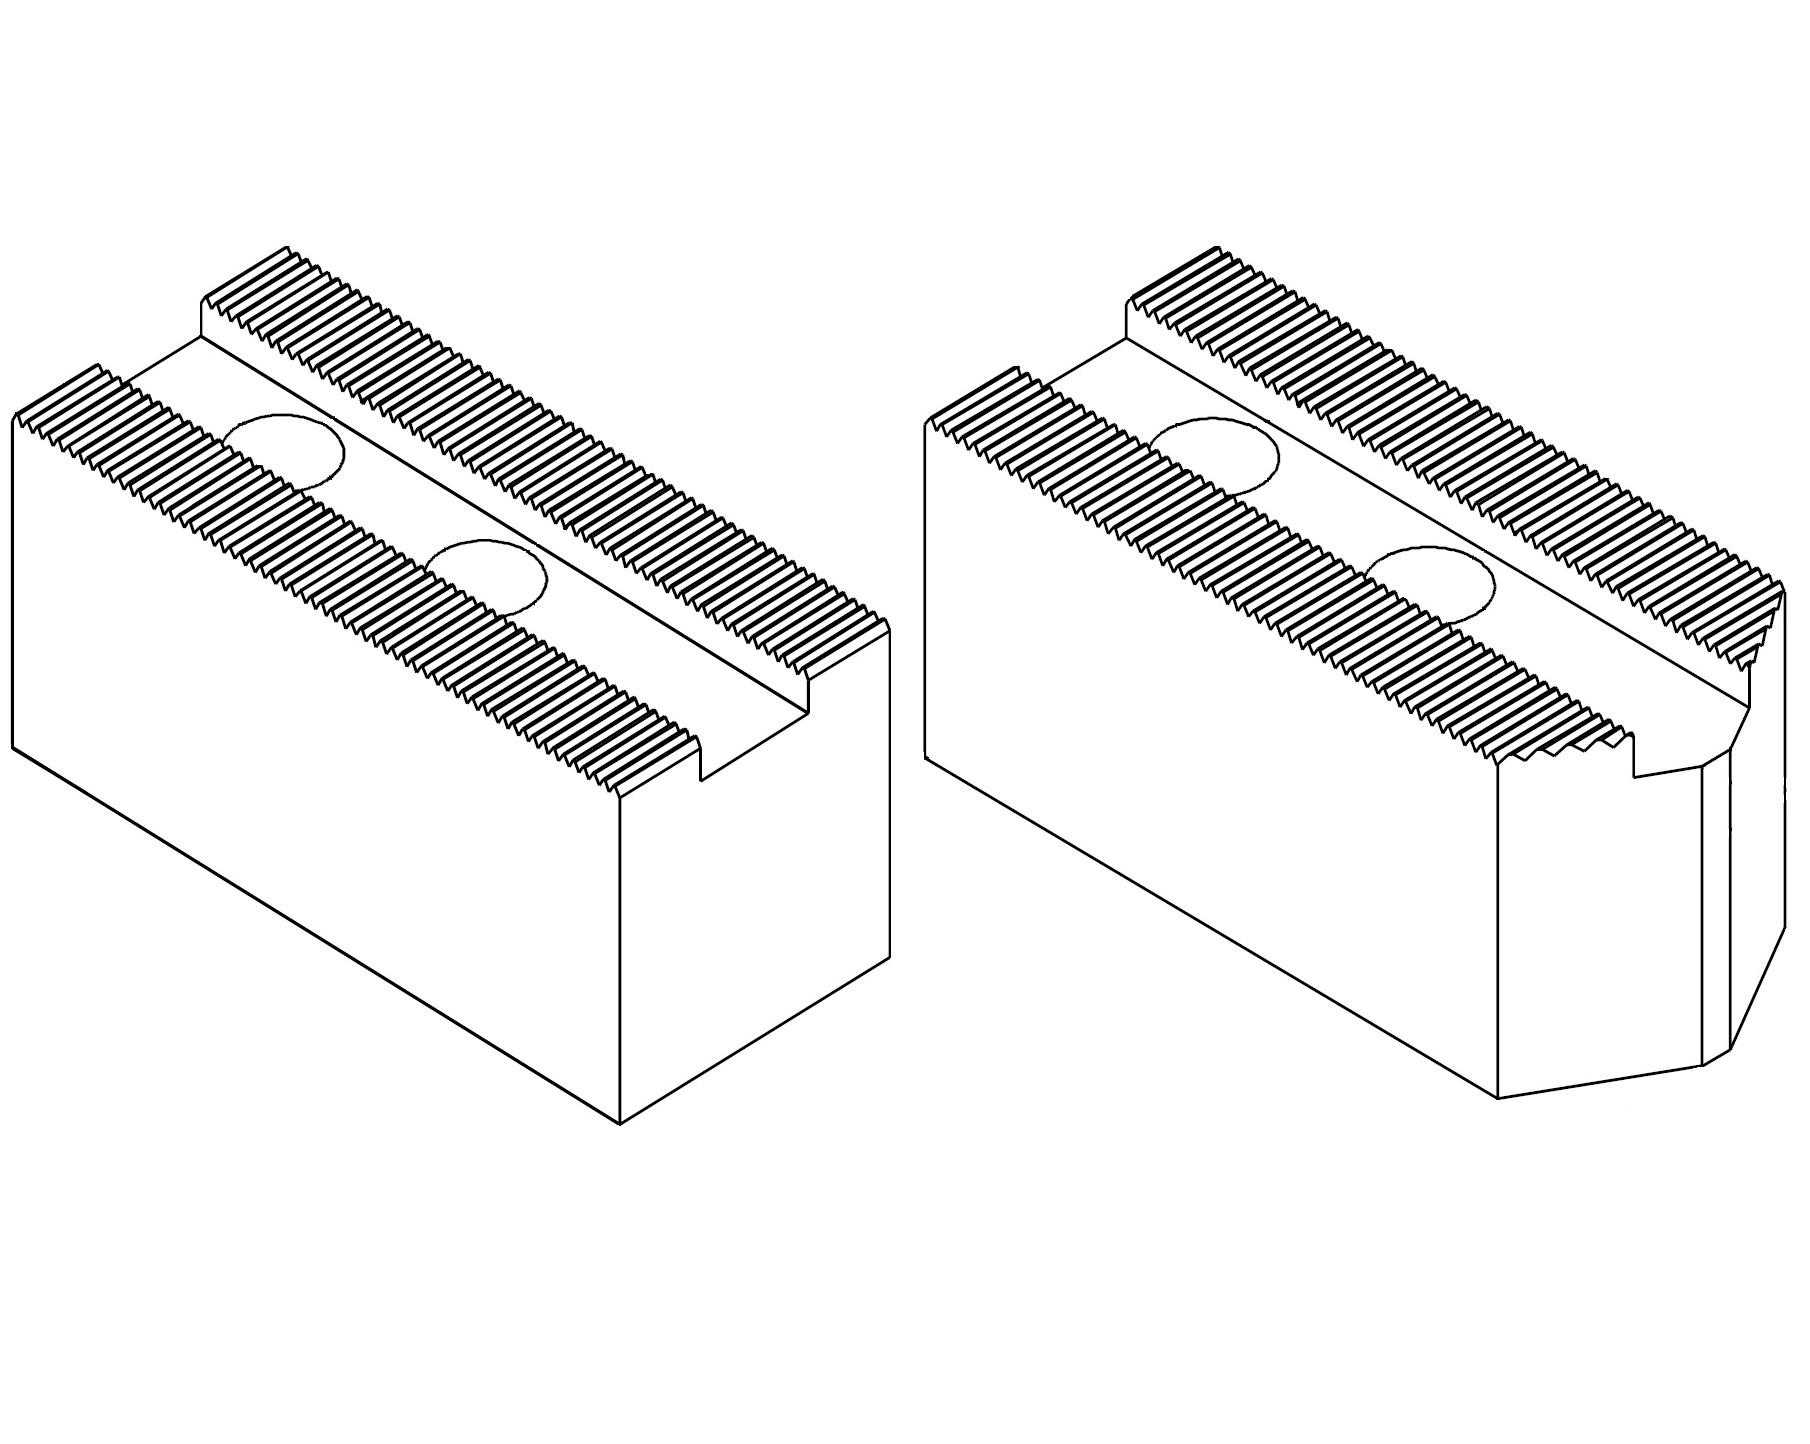 Čelisti měkké 1,5x60°, šířka drážky - 21 (sklíčidla pr. 300-315mm)